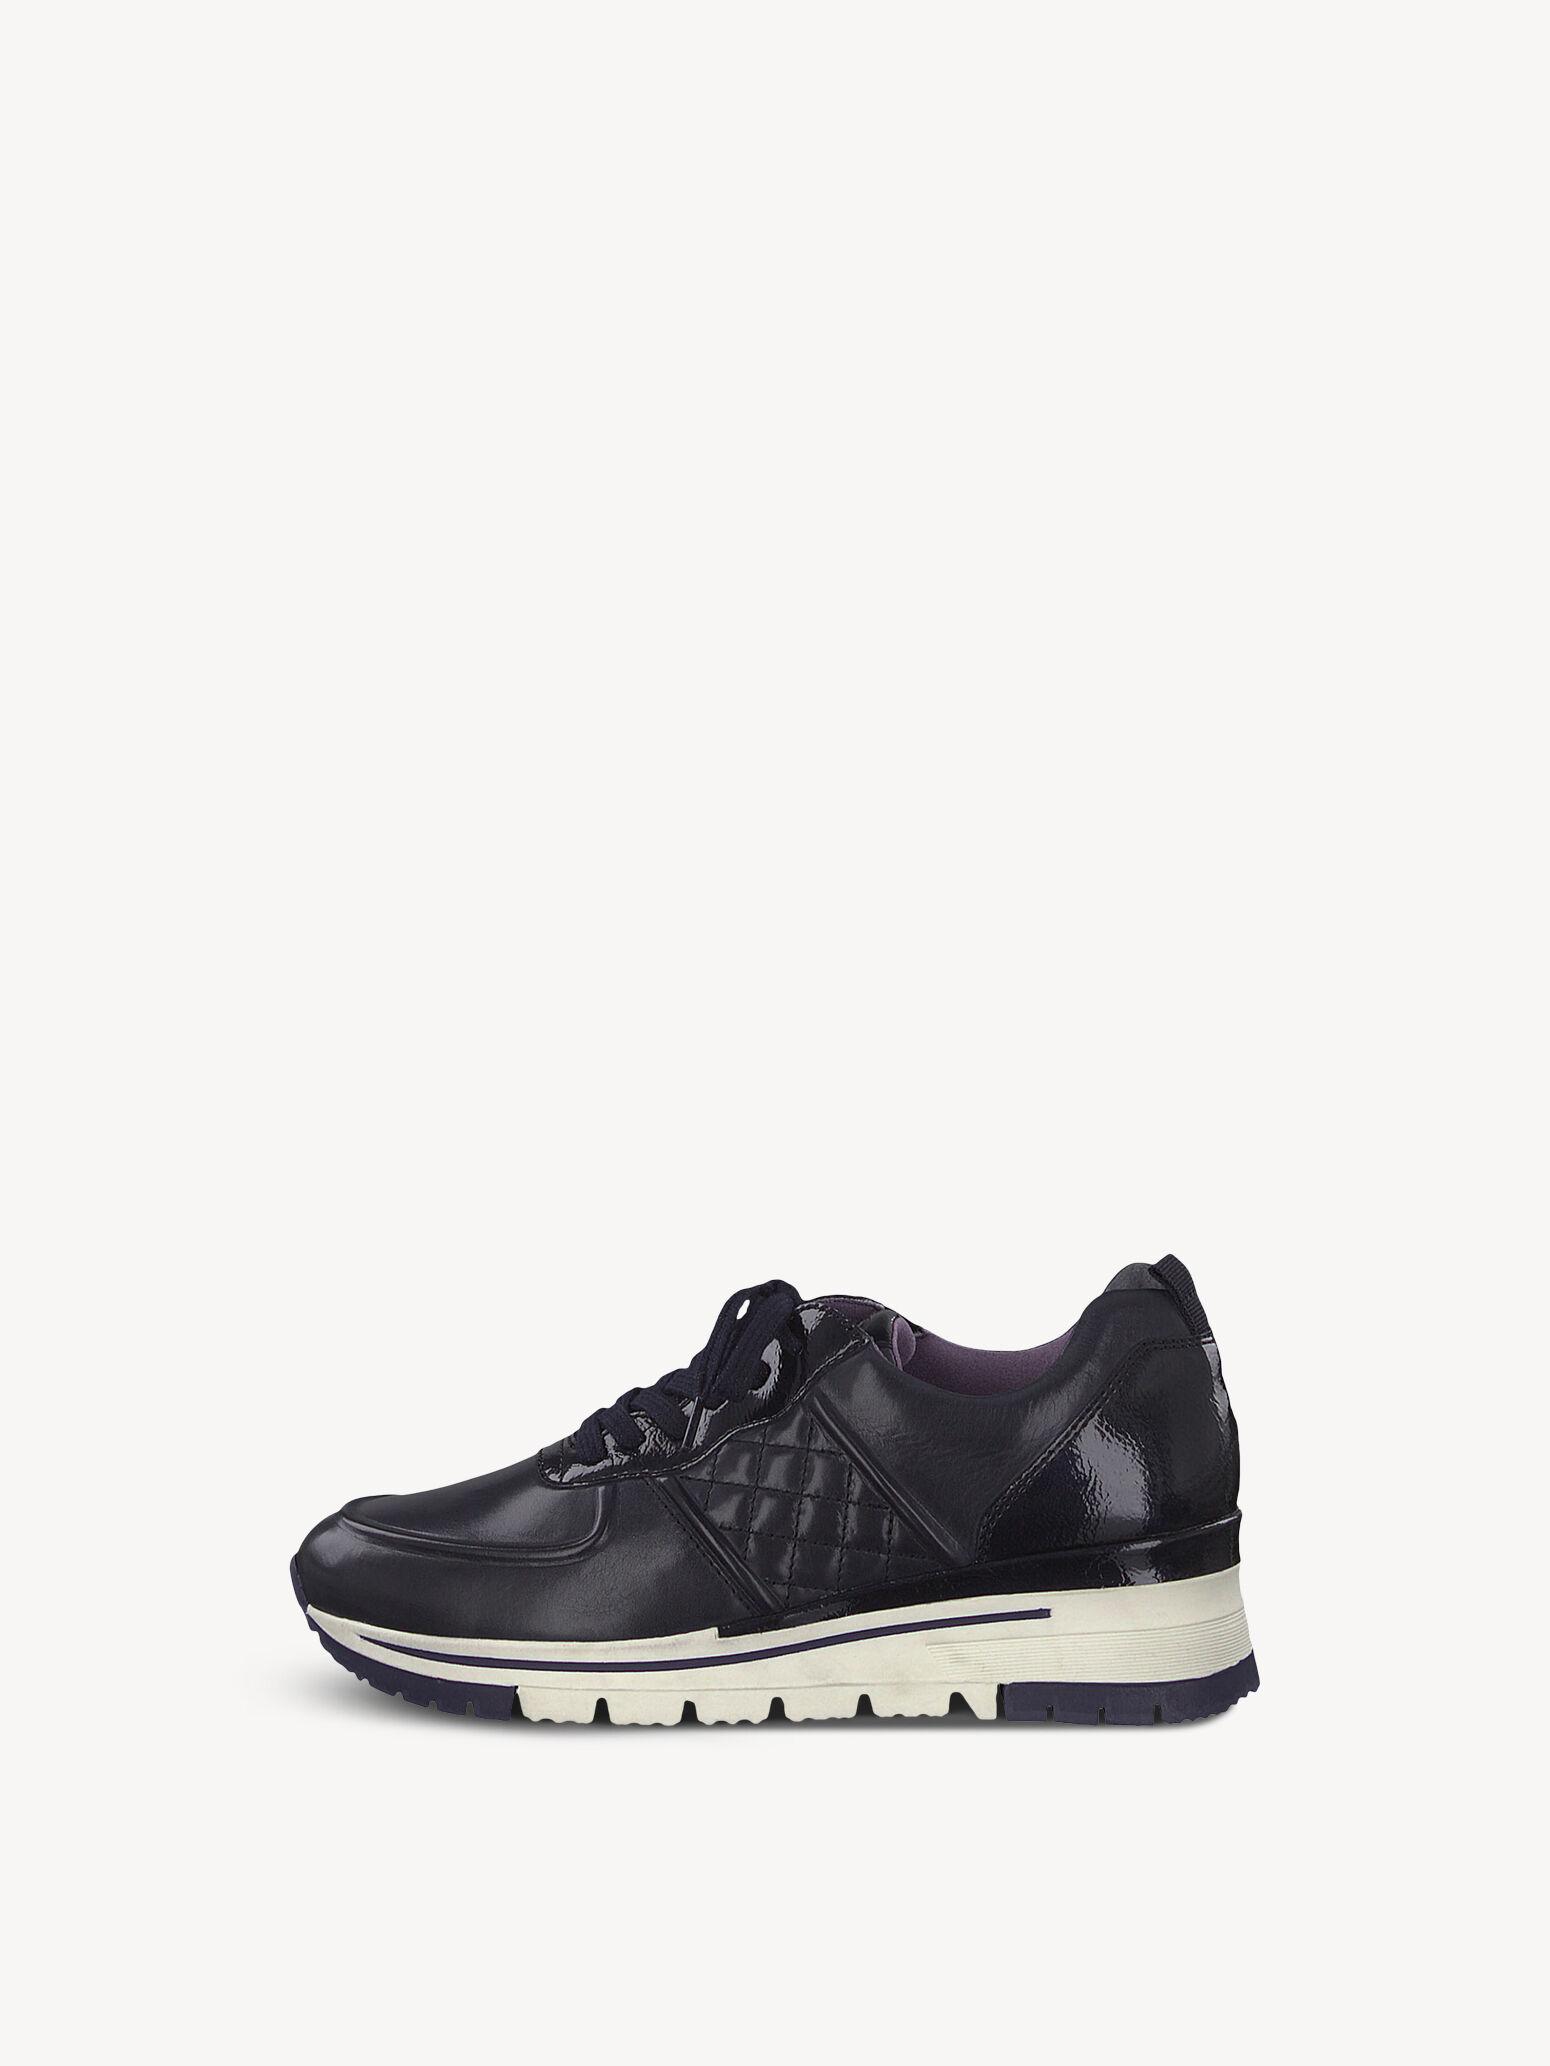 Sneakers Gelb online kaufen | BAUR